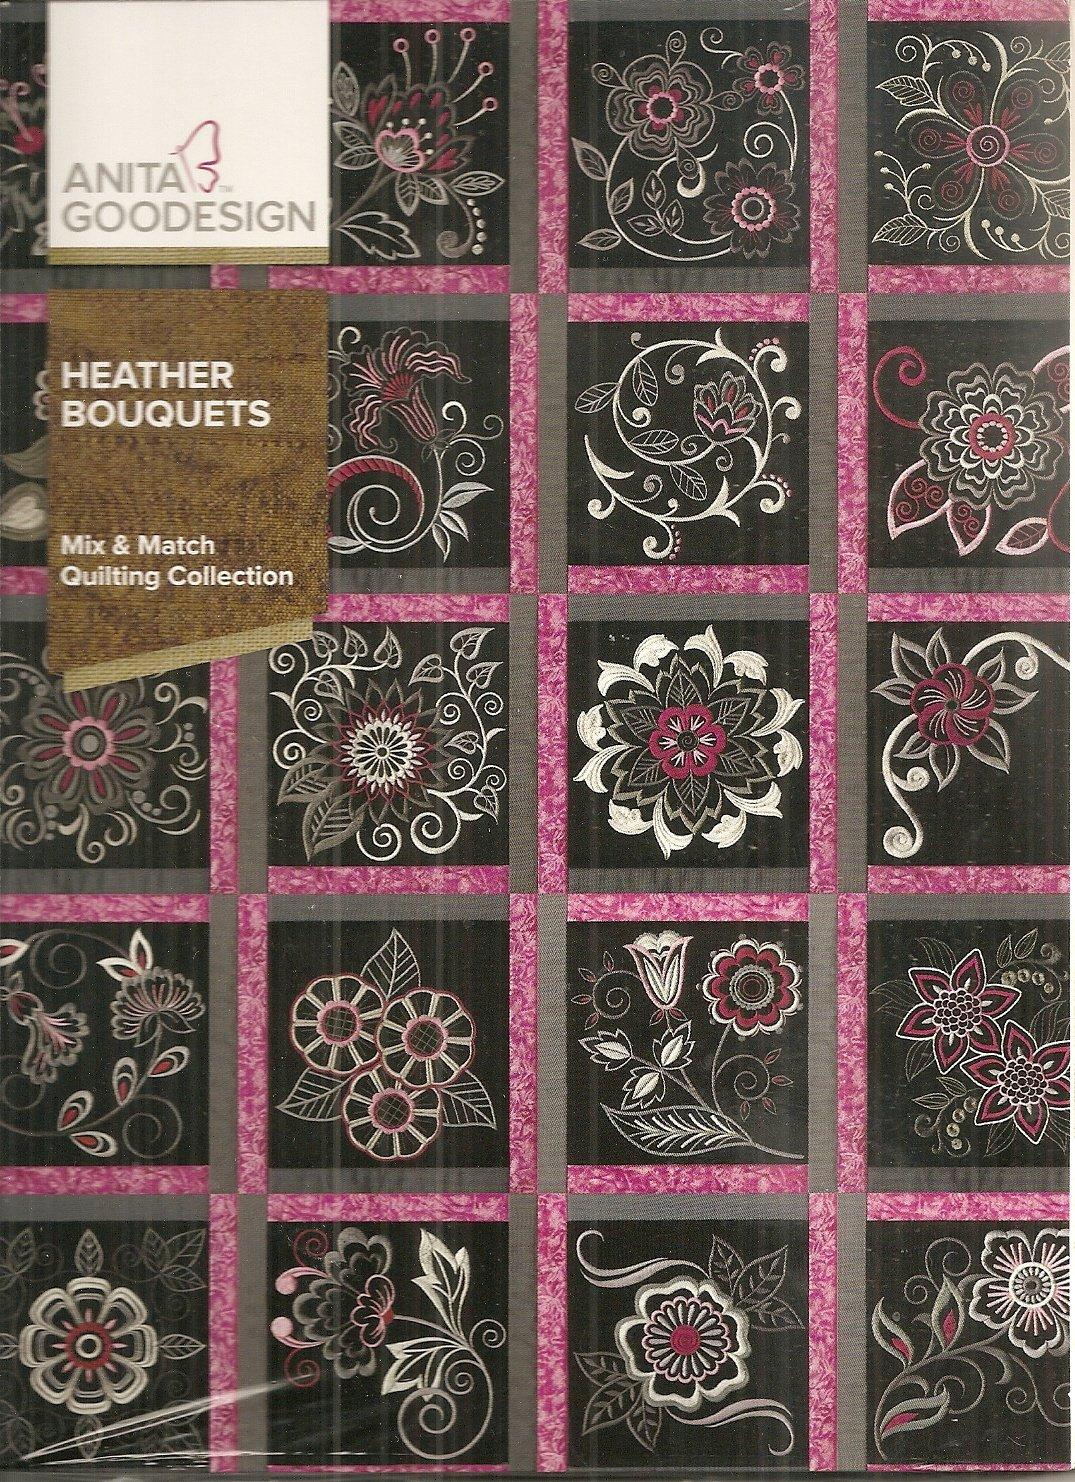 Anita Goodesign Heather Bouquets